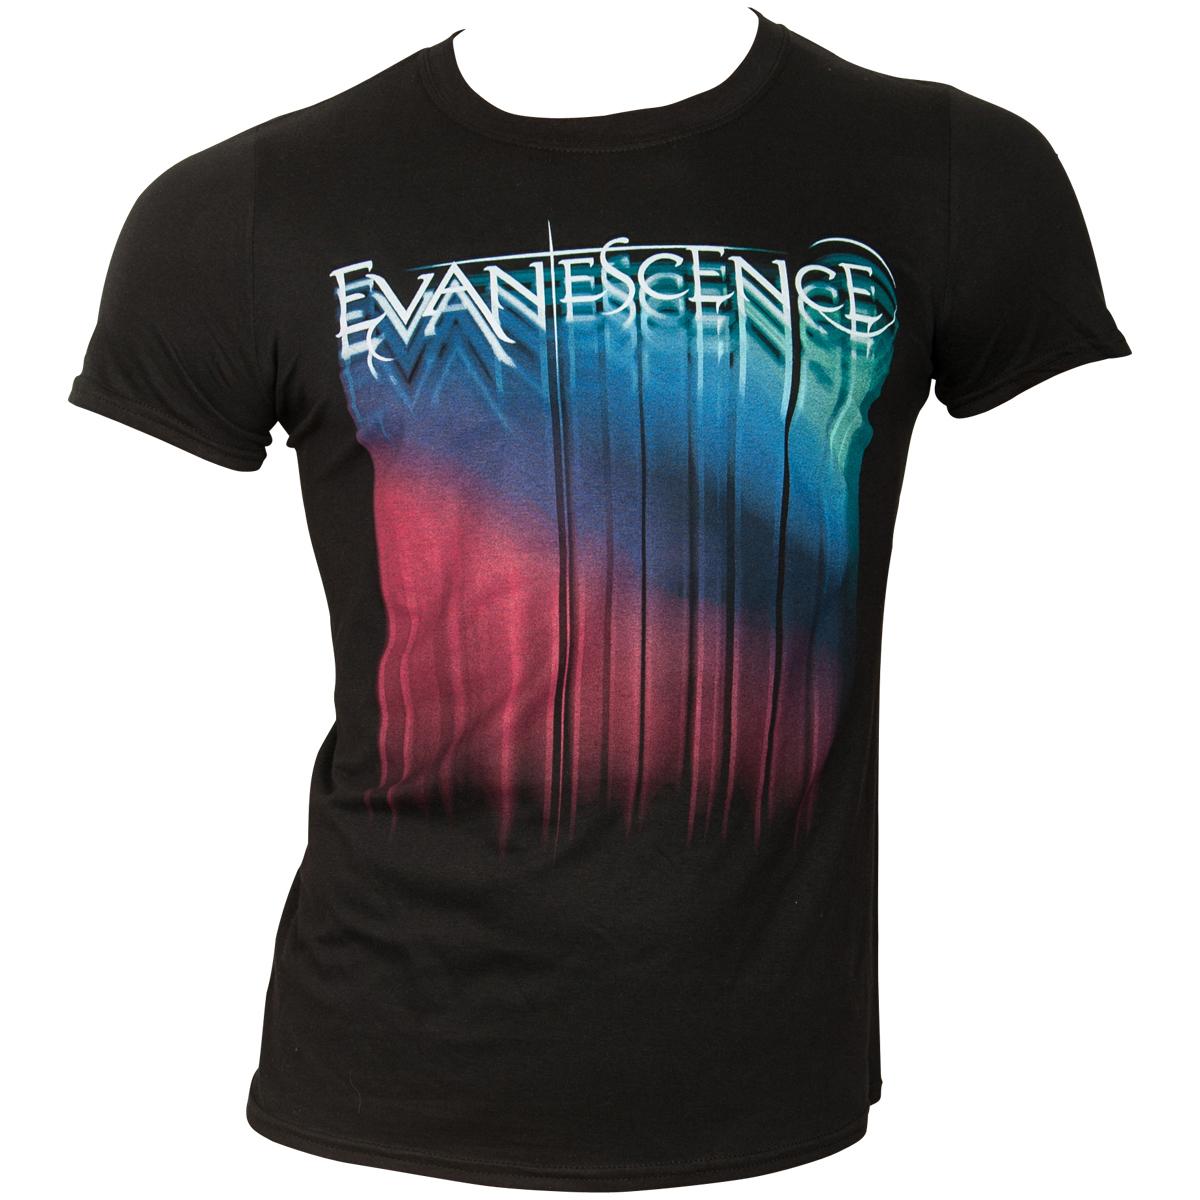 Evanescence - T-Shirt Tour Logo - schwarz